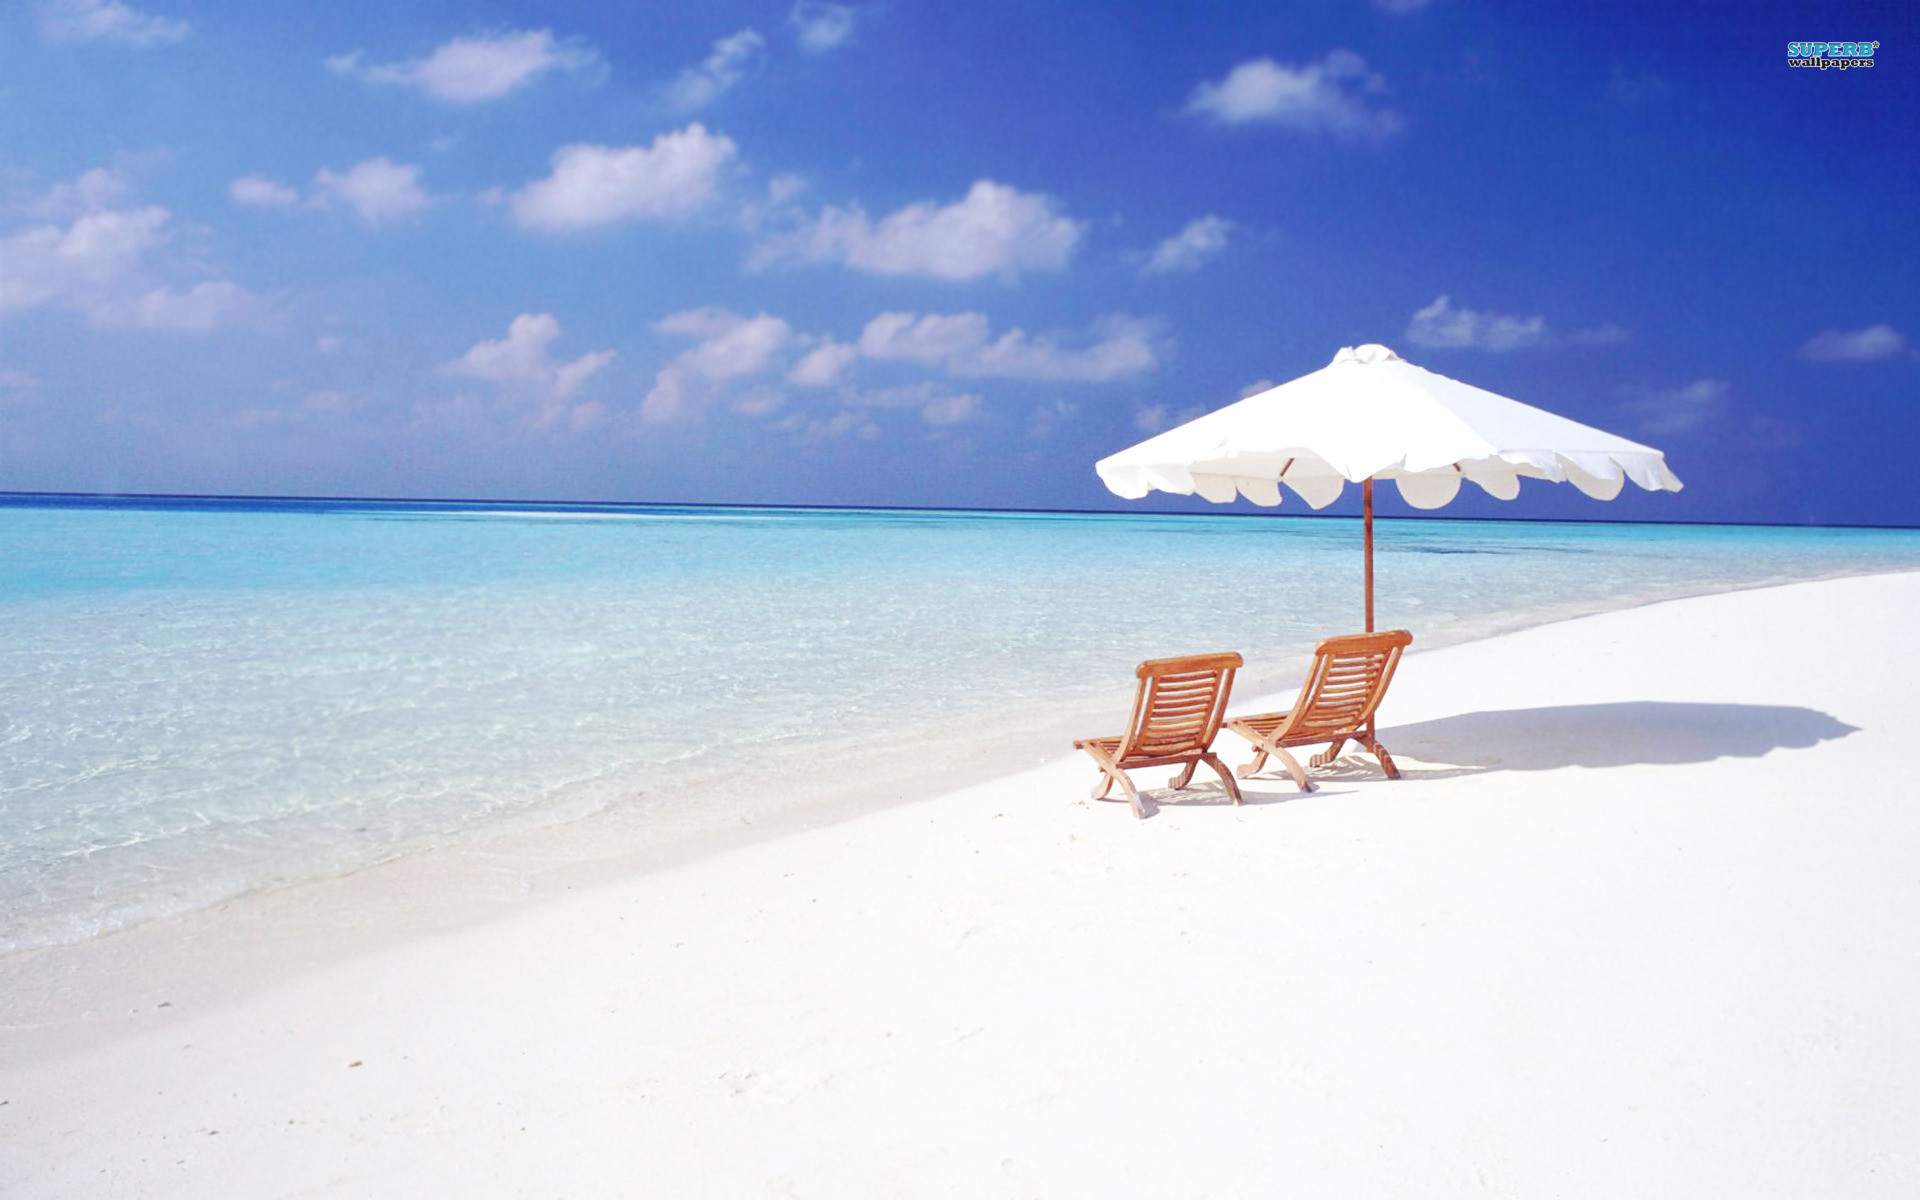 Best Beaches Desktop Wallpapers Images HD Wallpaper